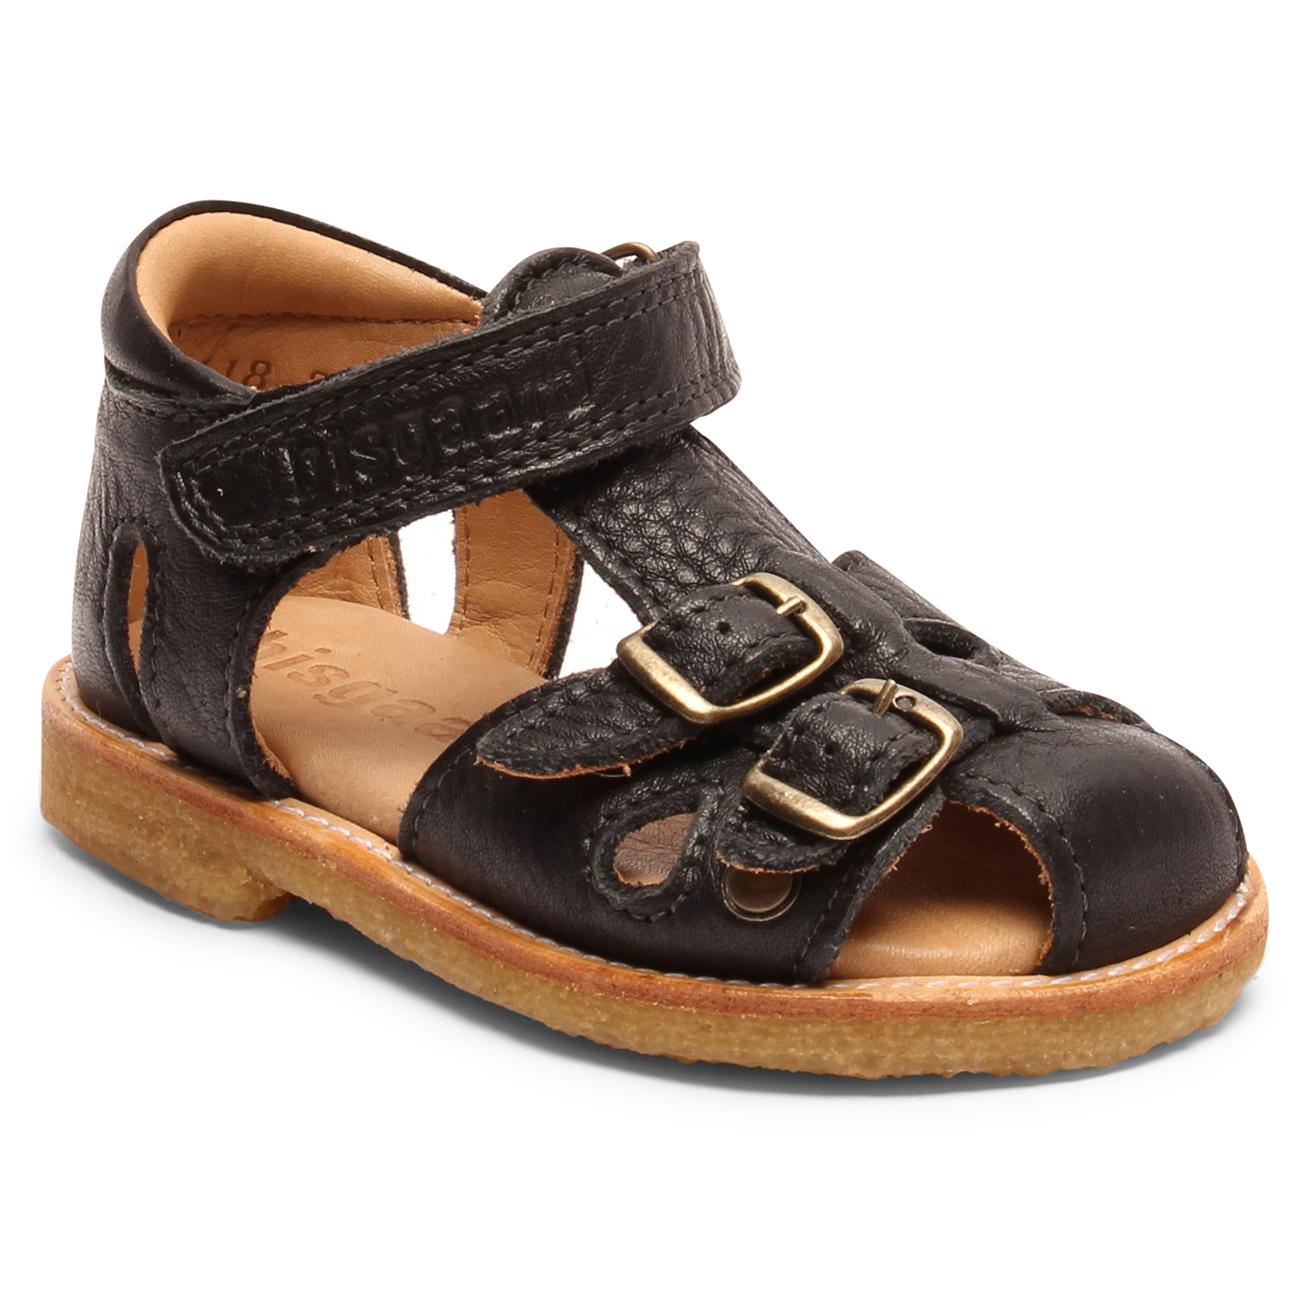 4e2d168559f2 Bisgaard-sandal-velcro-spaender-buckles-sort-black ...